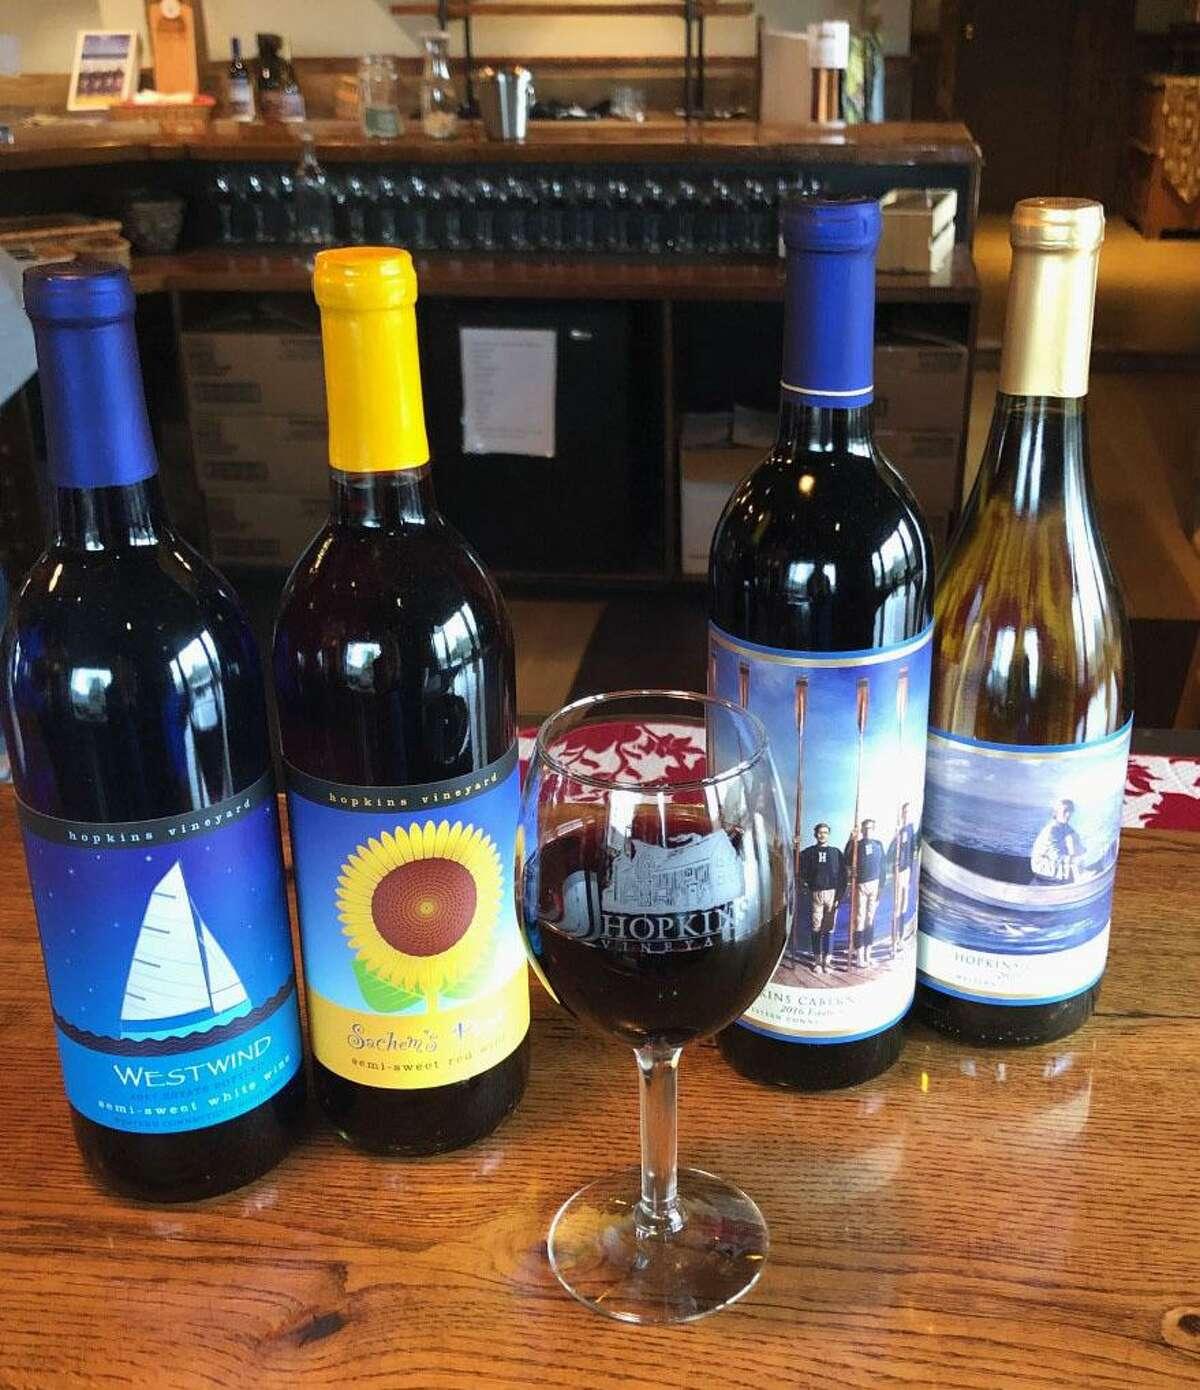 Hopkins Vineyard in Warren is part of the Connecticut Wine Trail.